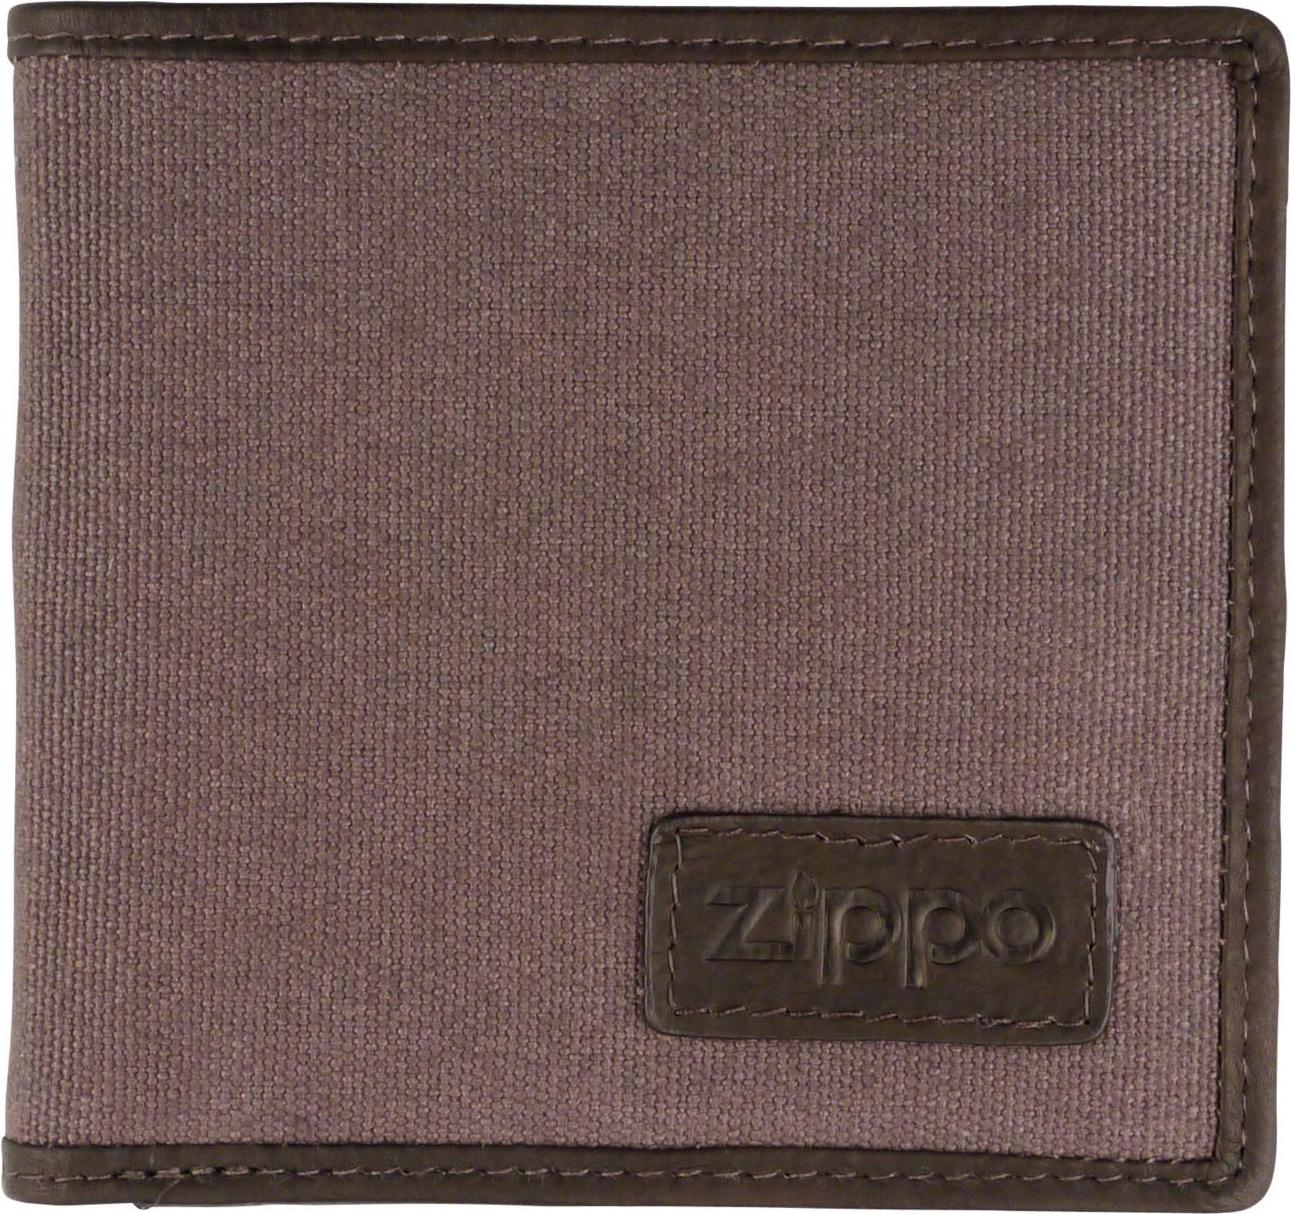 020f72f81840e ZIPPO Herren-Geldbeutel quer Textil innen Leder 2005120 - Zippo ...